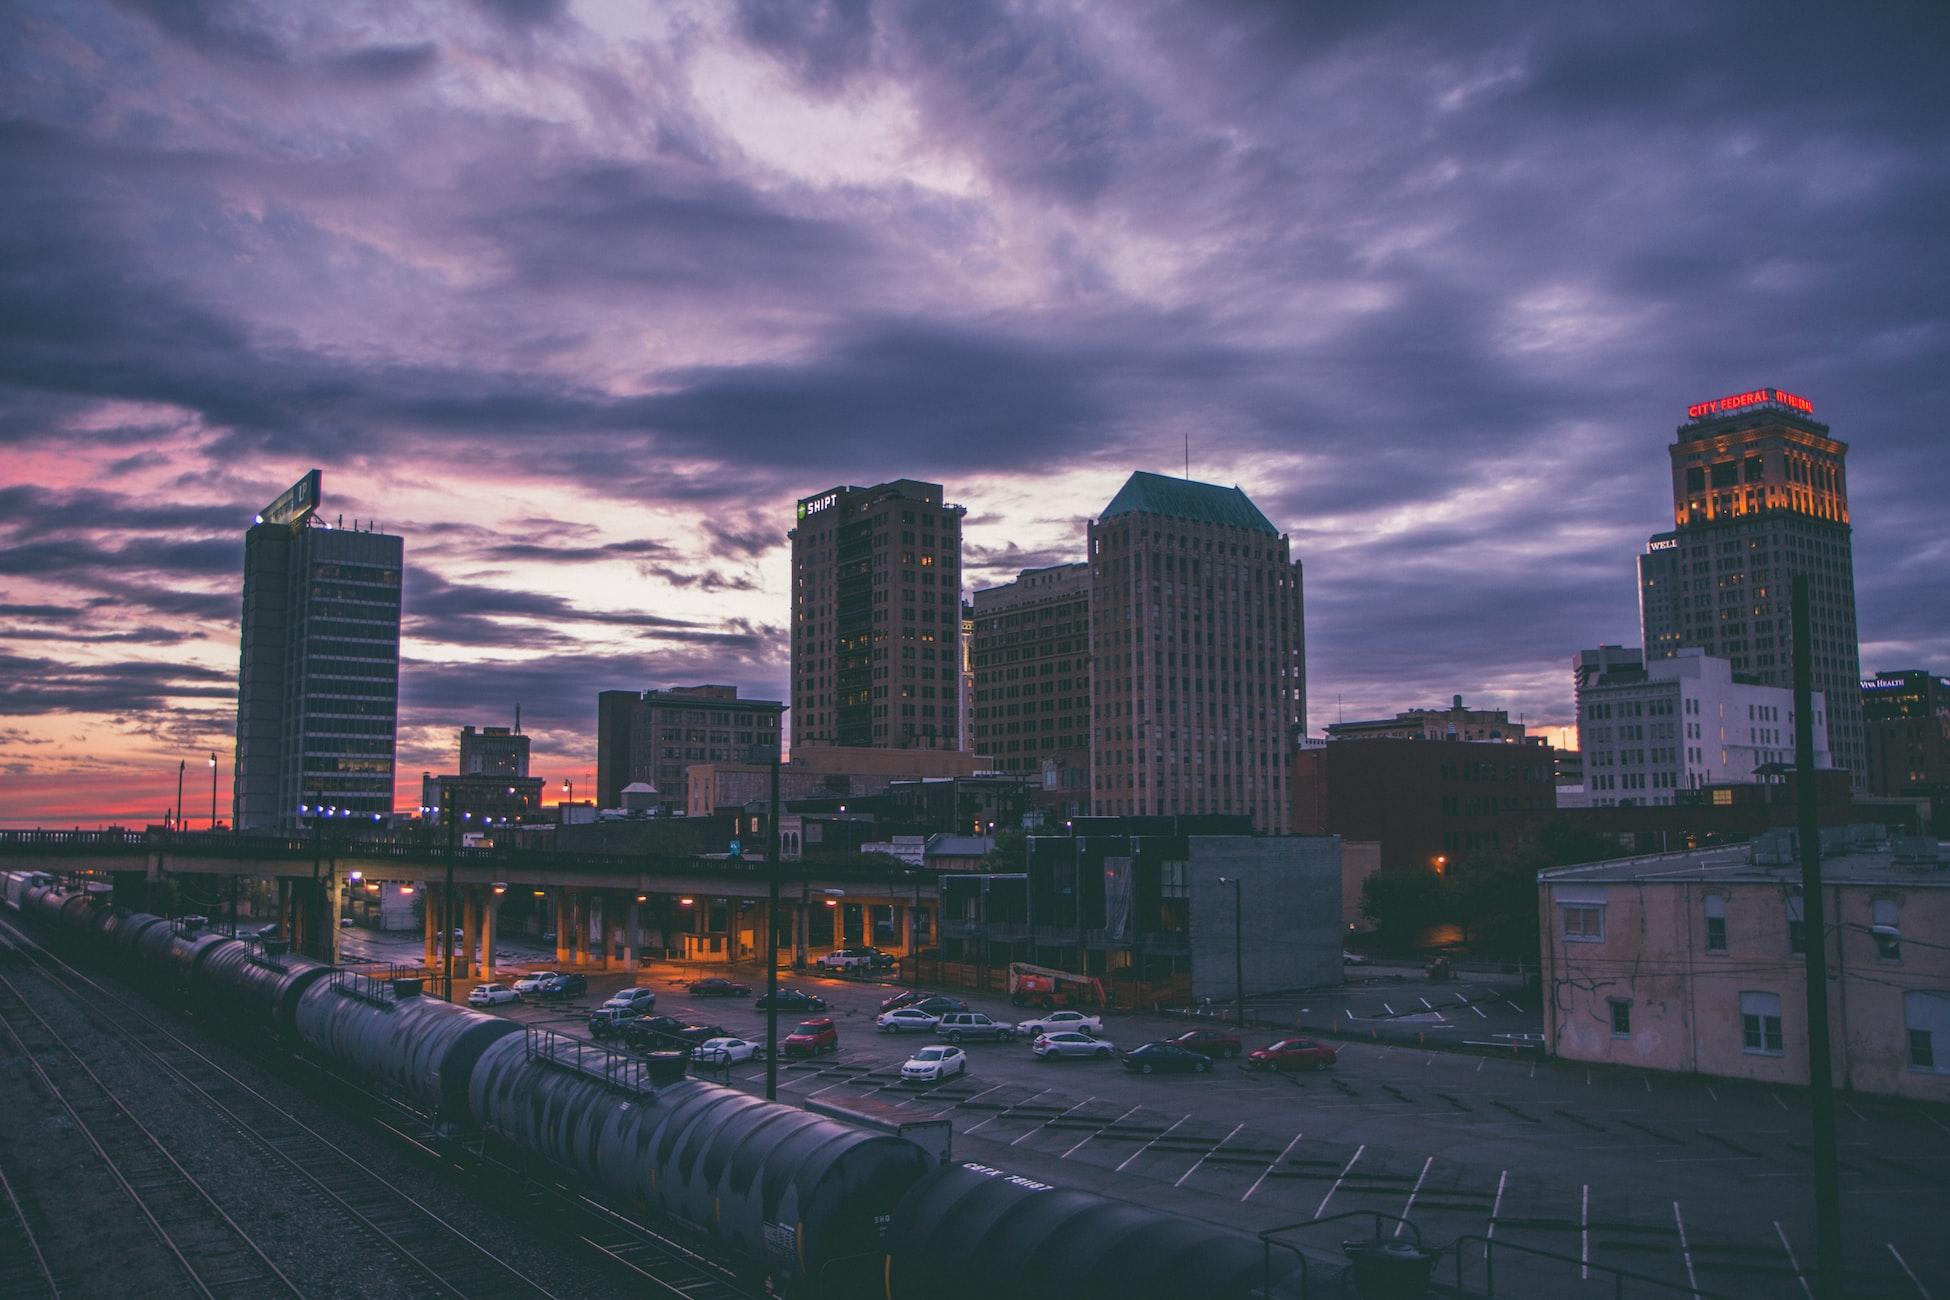 skyline of Birmingham, AL